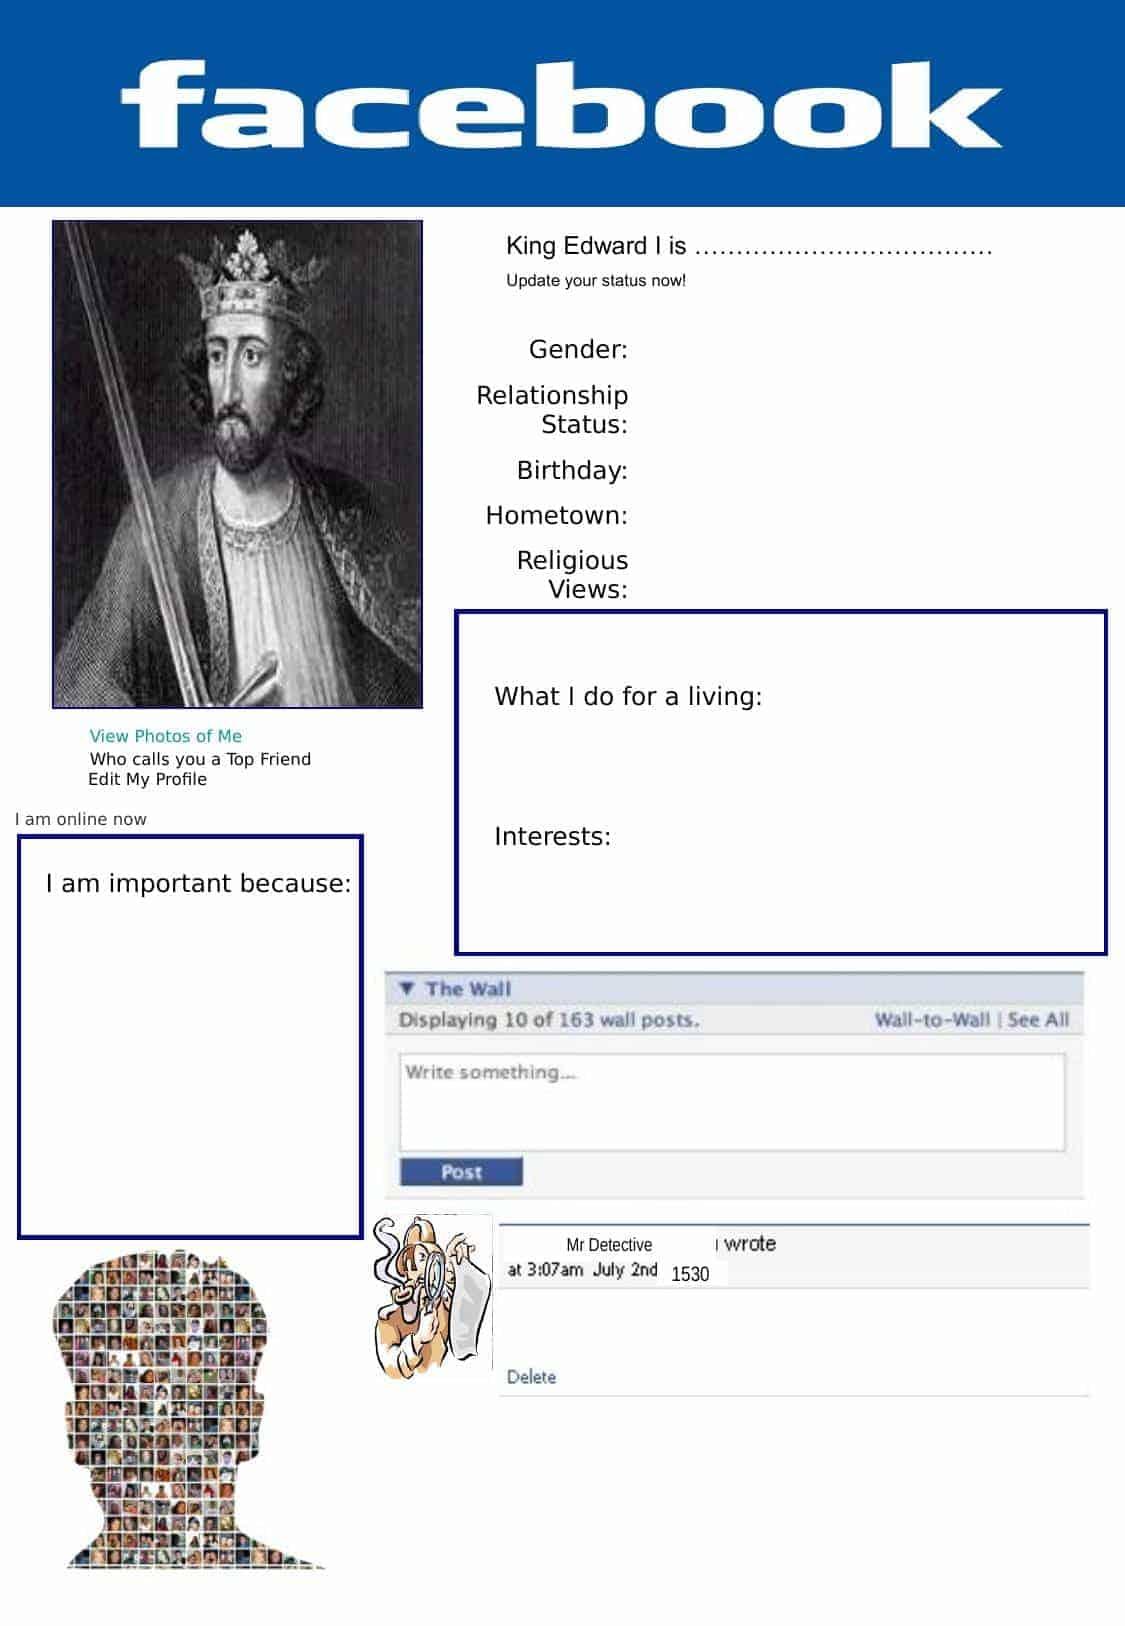 King Edward Facebook Fun Task